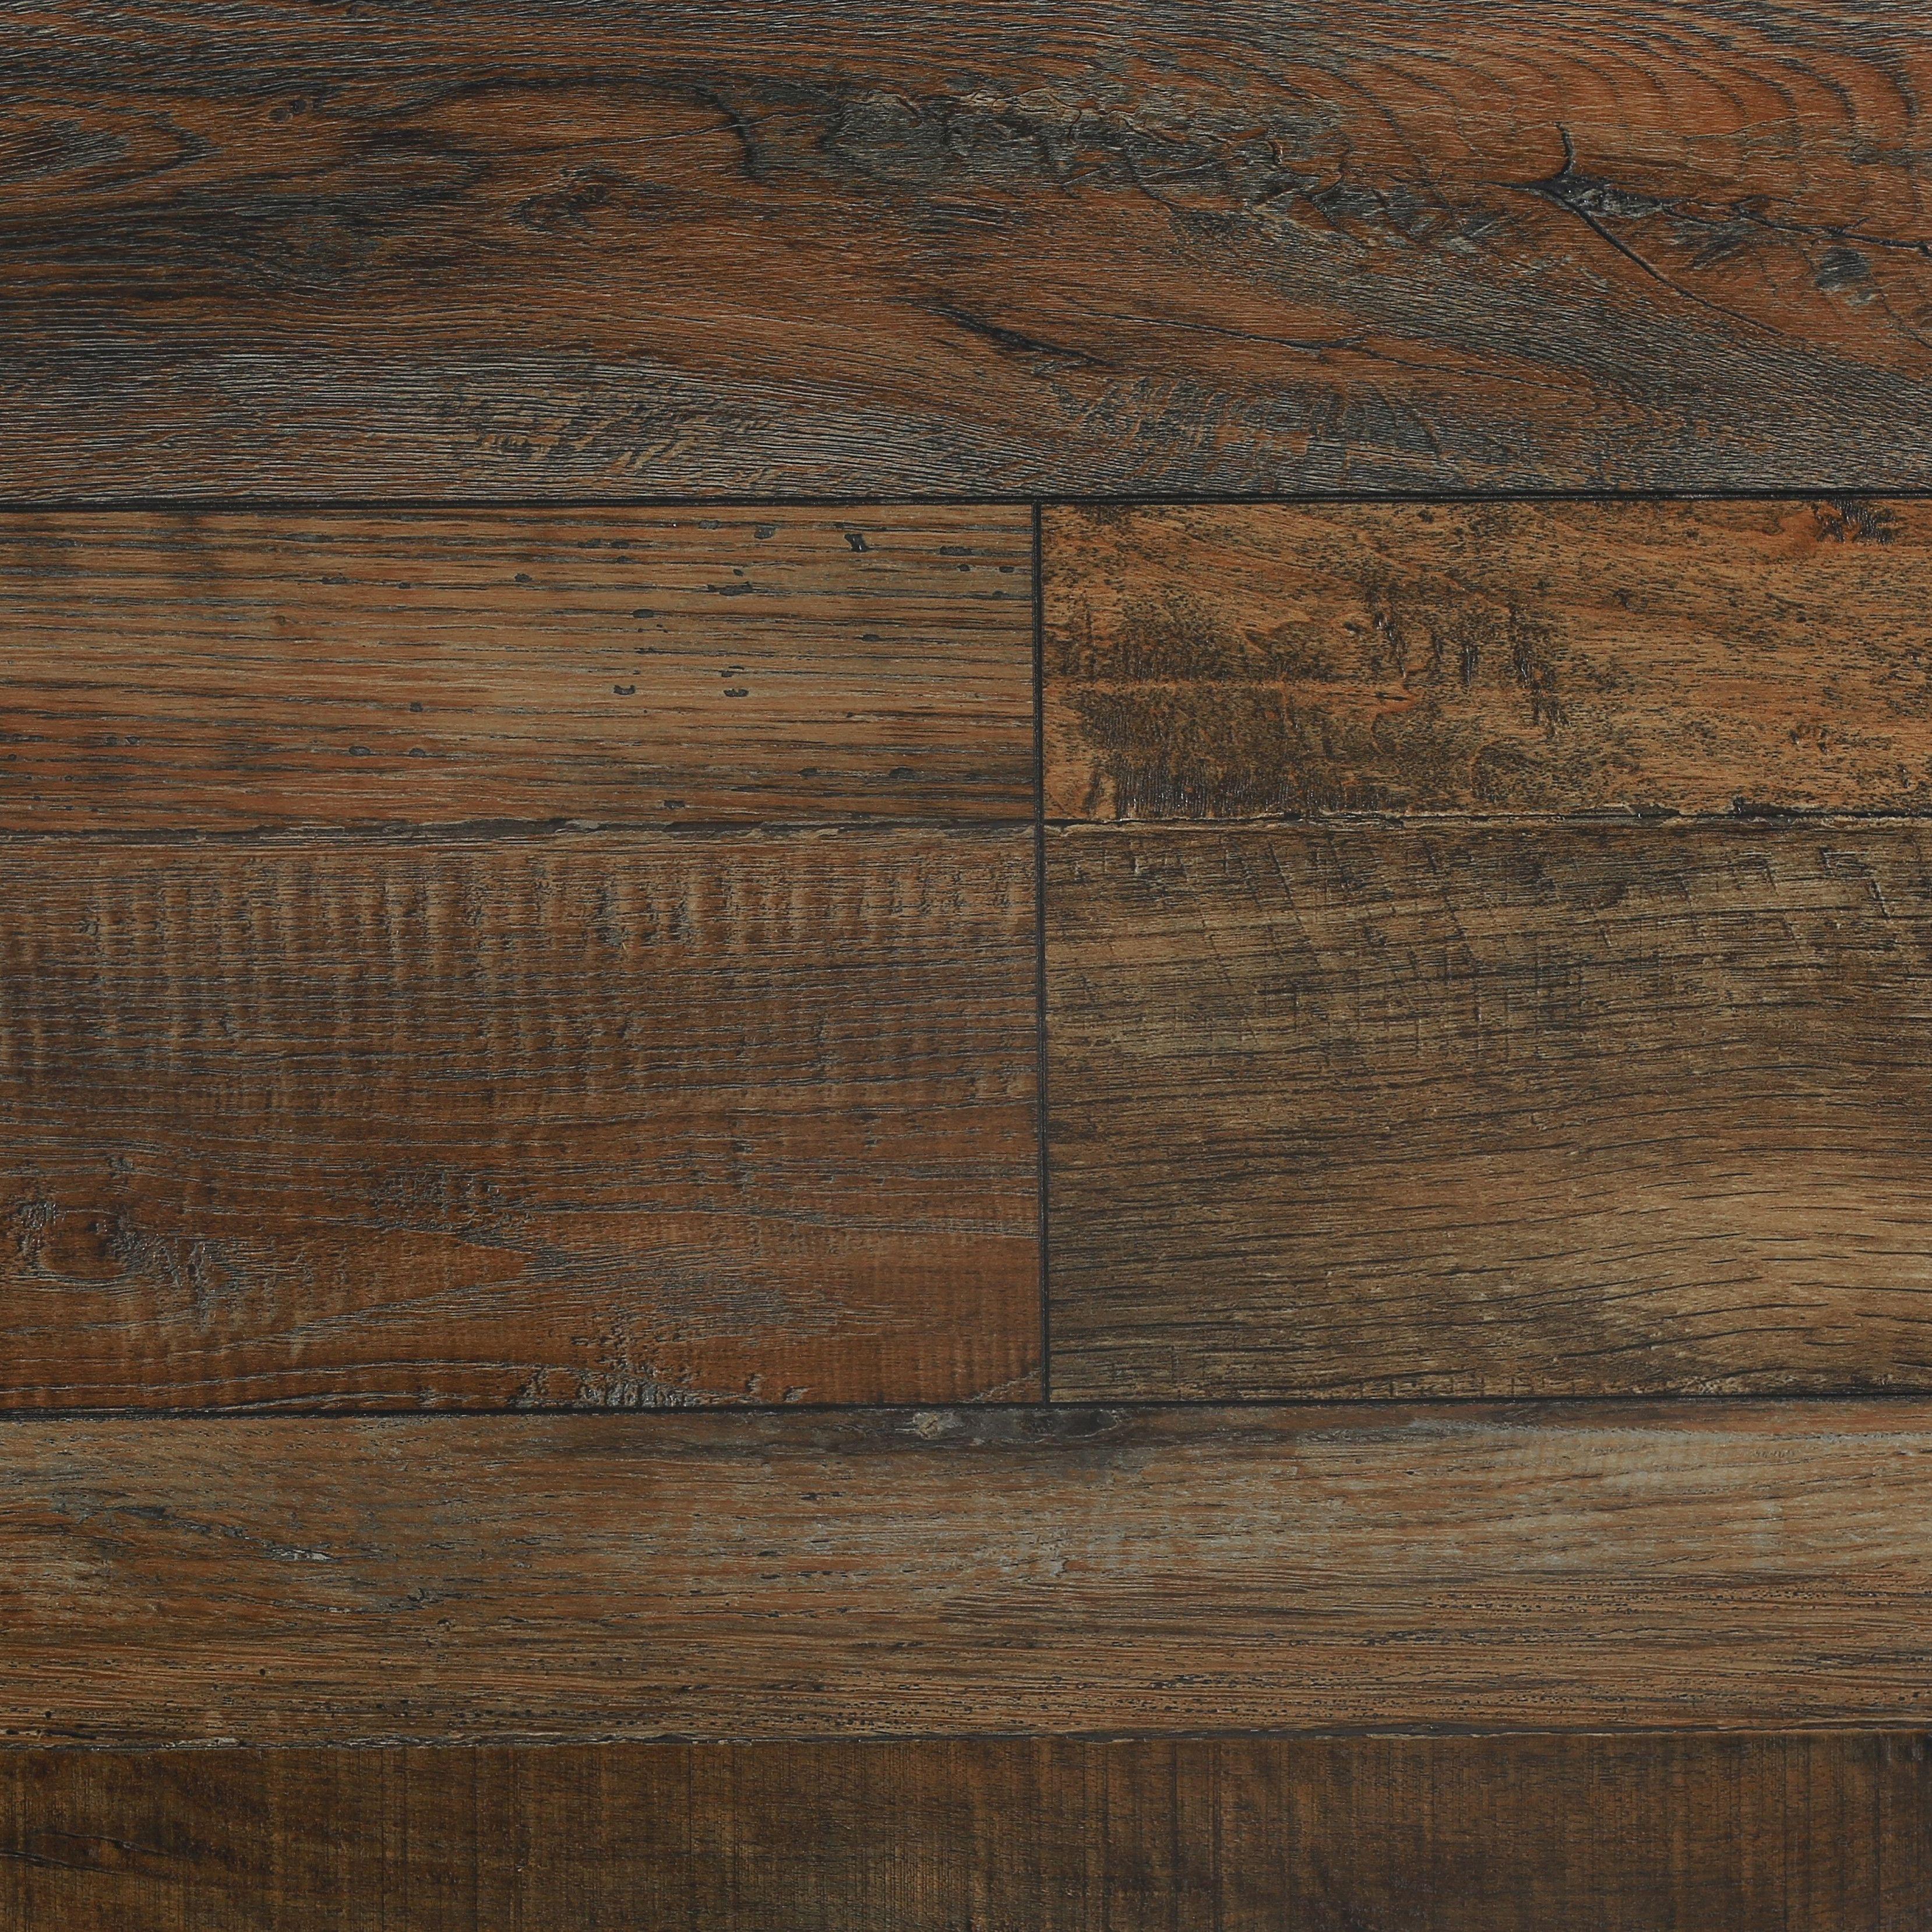 Serradon 8 X 48 X 12 3mm Laminate In Vintage Sable Flooring Hardwood Floors Laminate Flooring